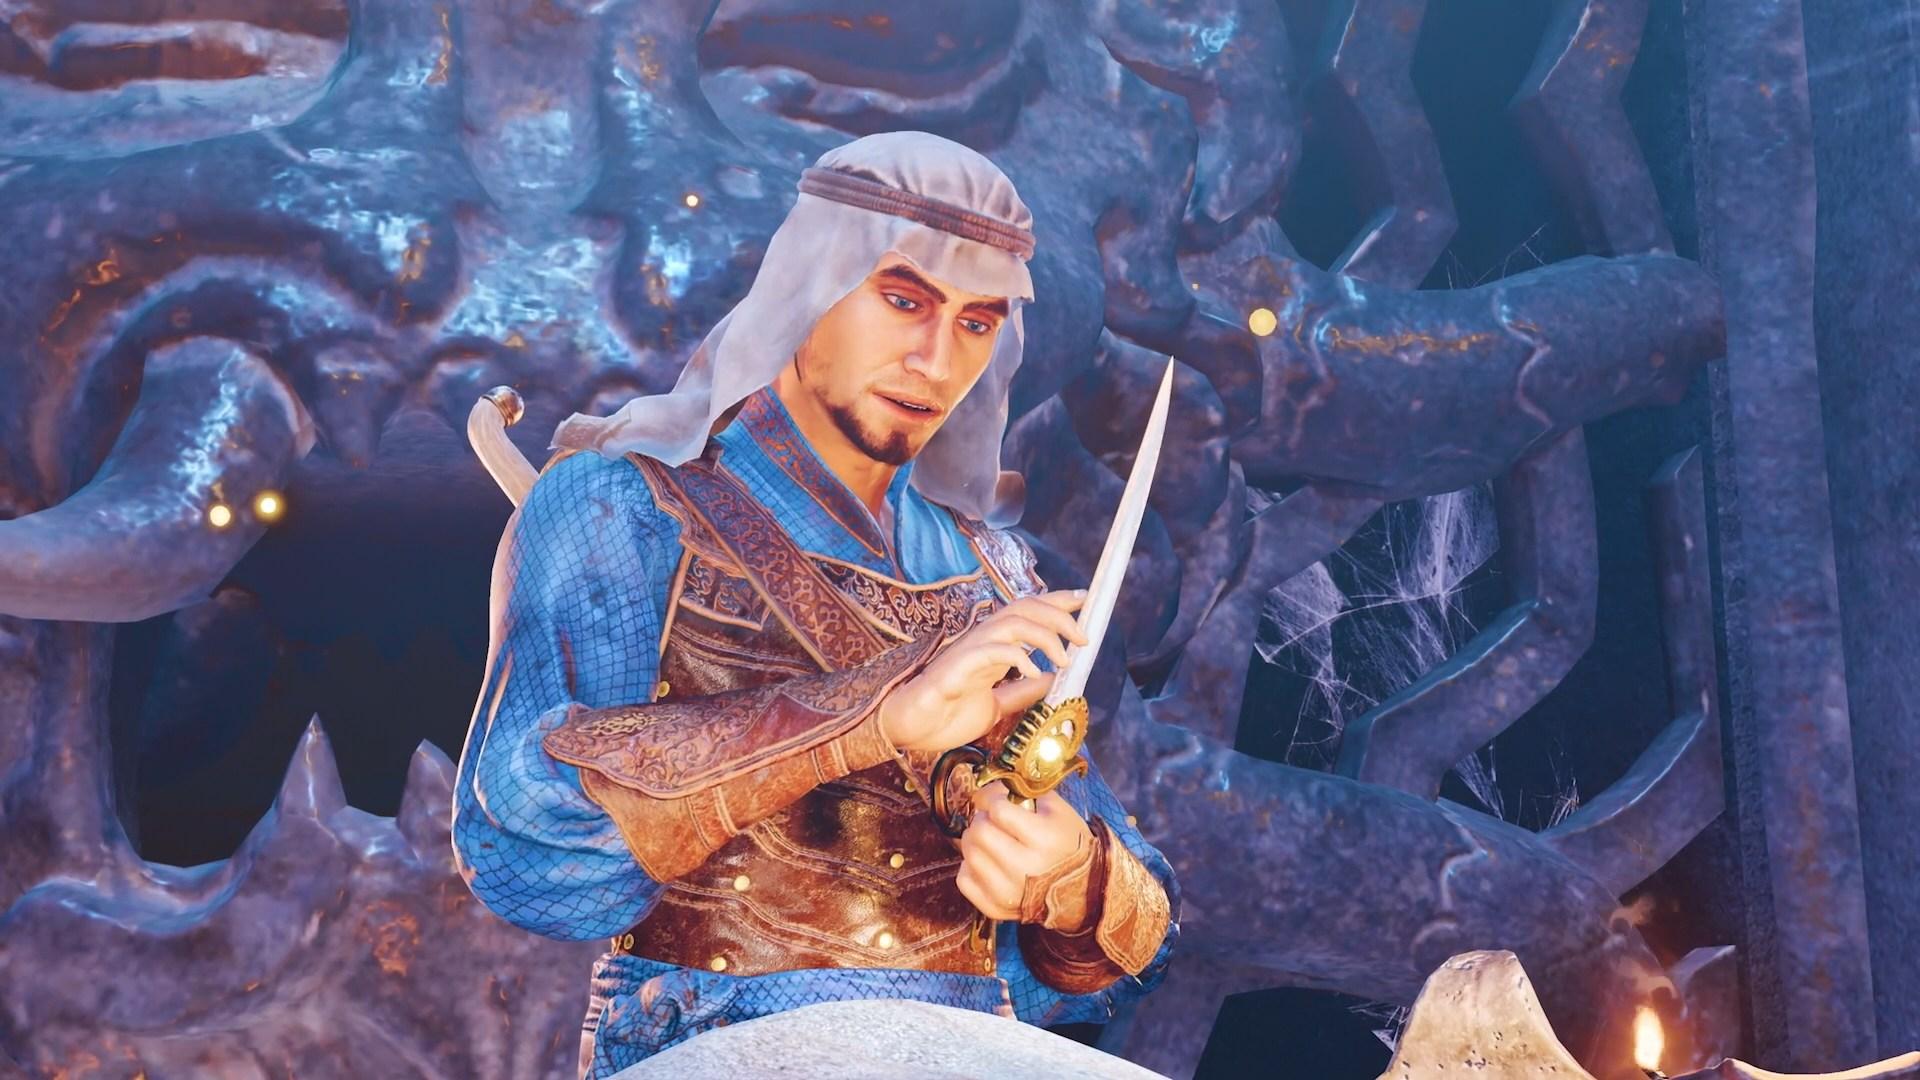 Trailer, Ubisoft, Adventure, Remake, Prince of Persia, Prince of Persia: The Sands of Time, The Sands of Time